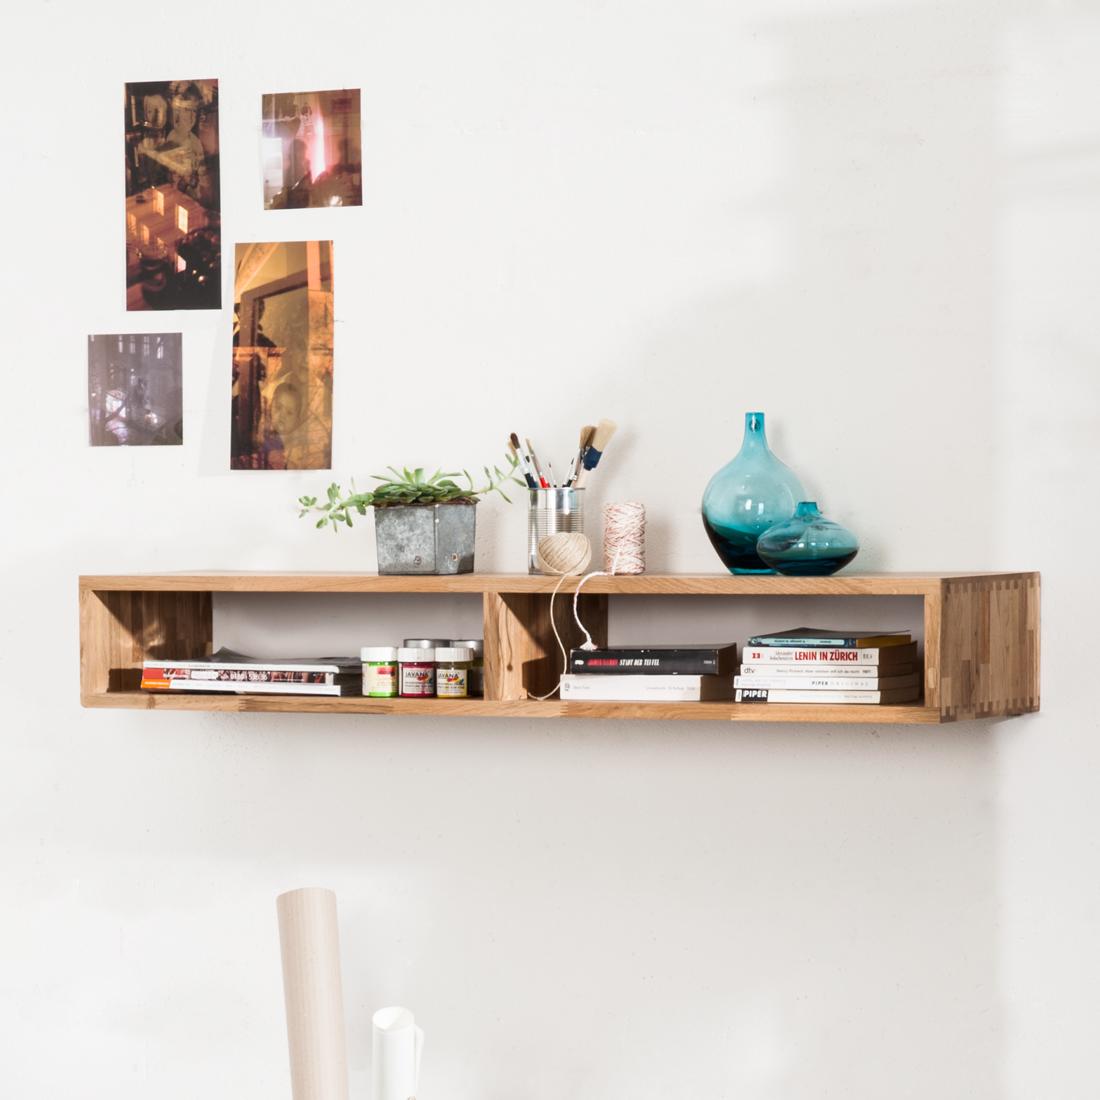 wandregal eiche massivholz steckboard b cherregal wandboard h ngeregal regal neu ebay. Black Bedroom Furniture Sets. Home Design Ideas